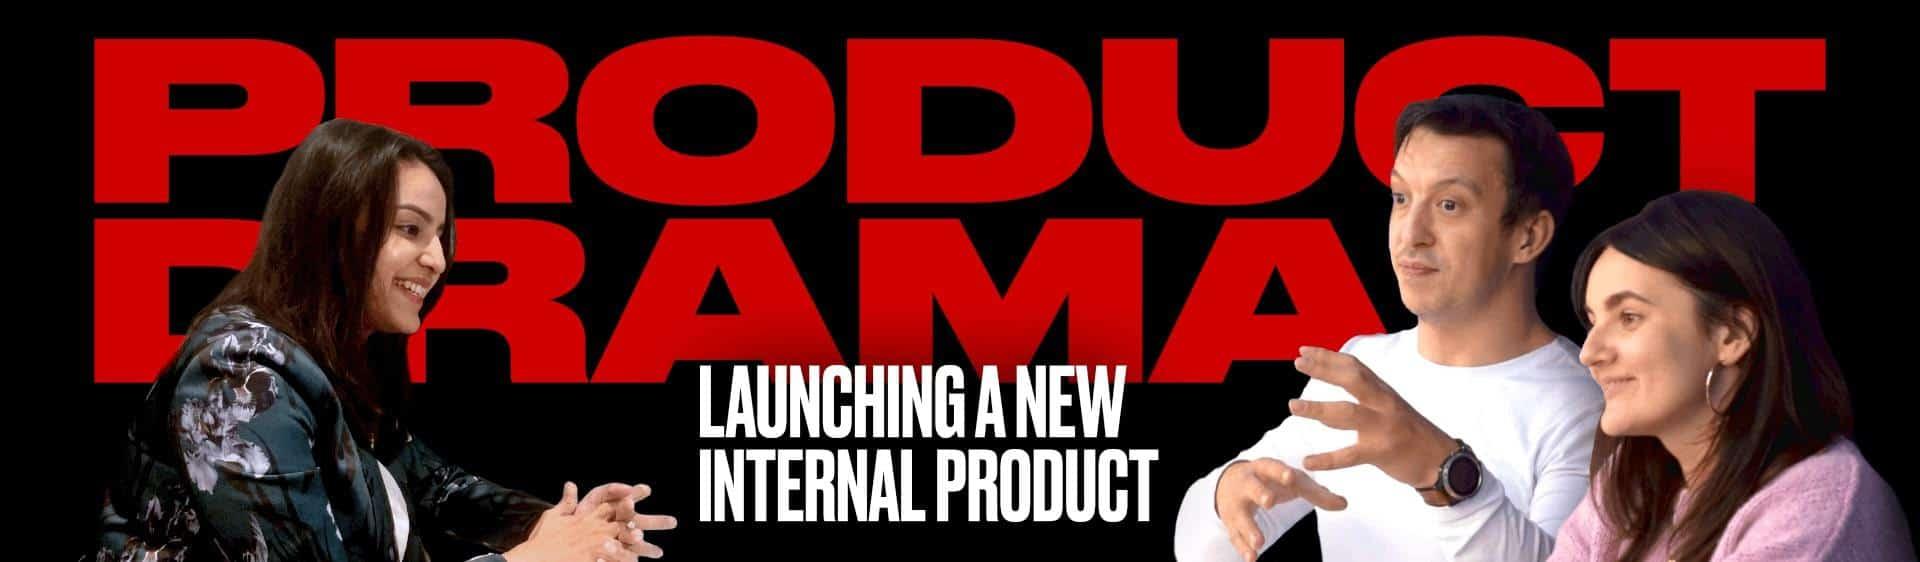 launching an internal product